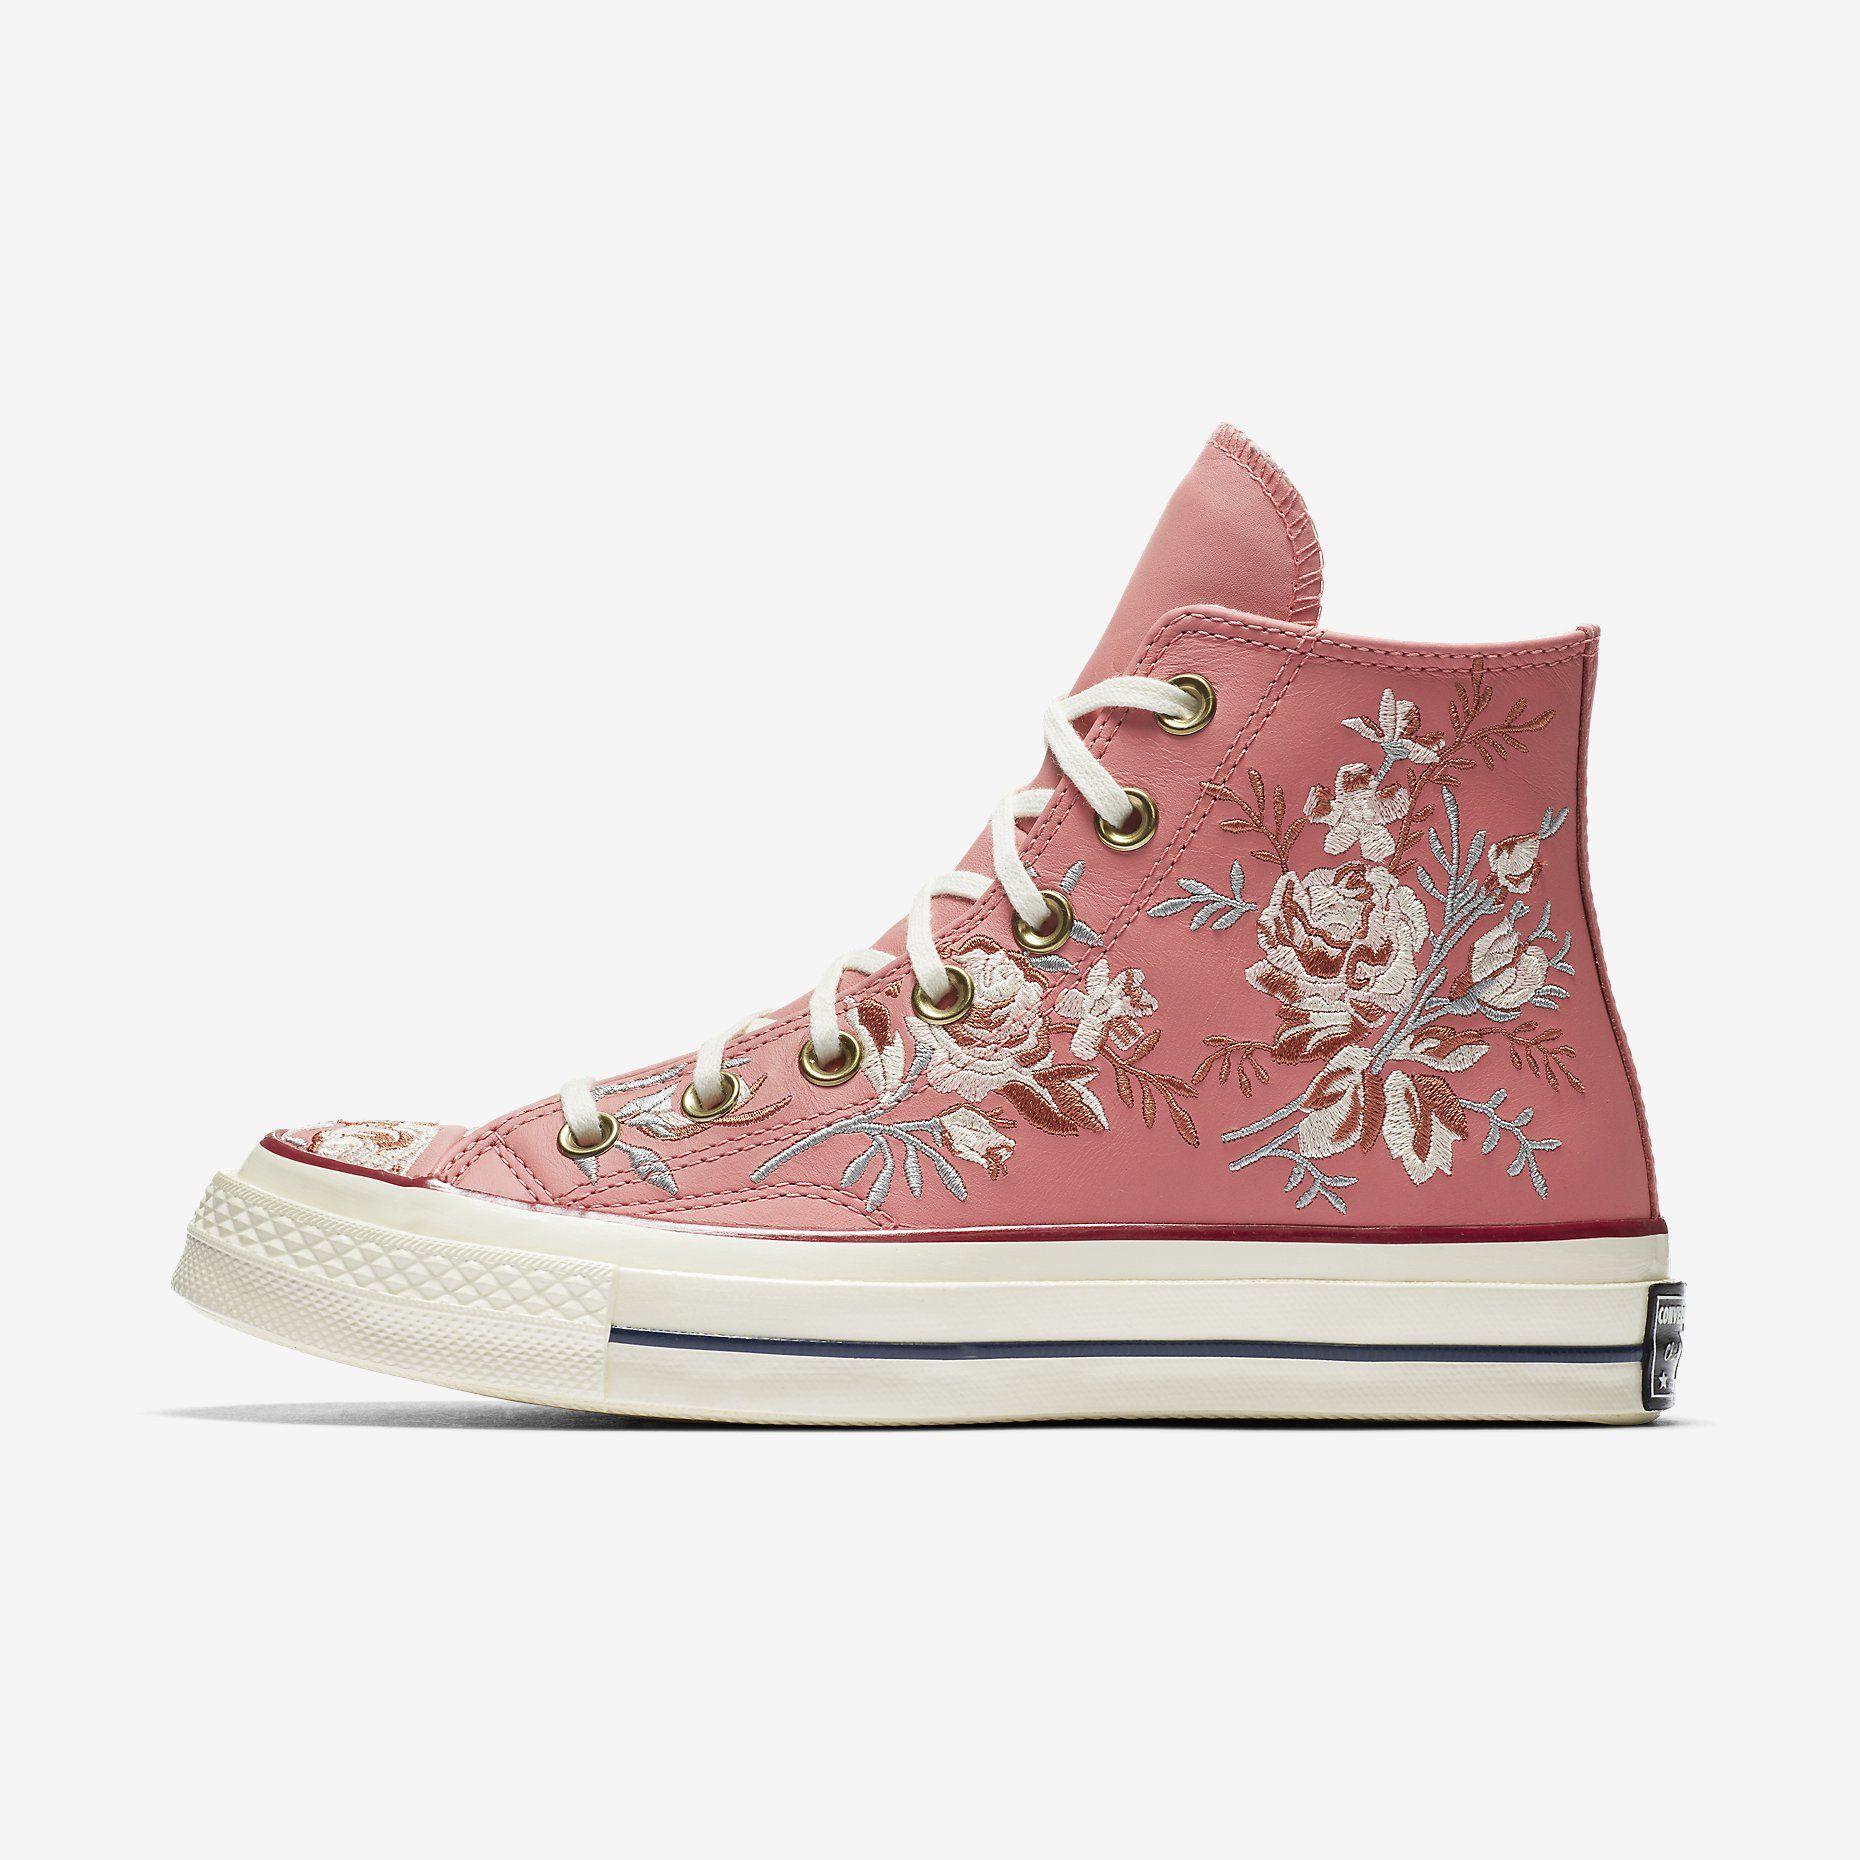 9302a7a13bde Converse Chuck 70 Parkway Floral High Top Women s Shoe. Nike.com ...